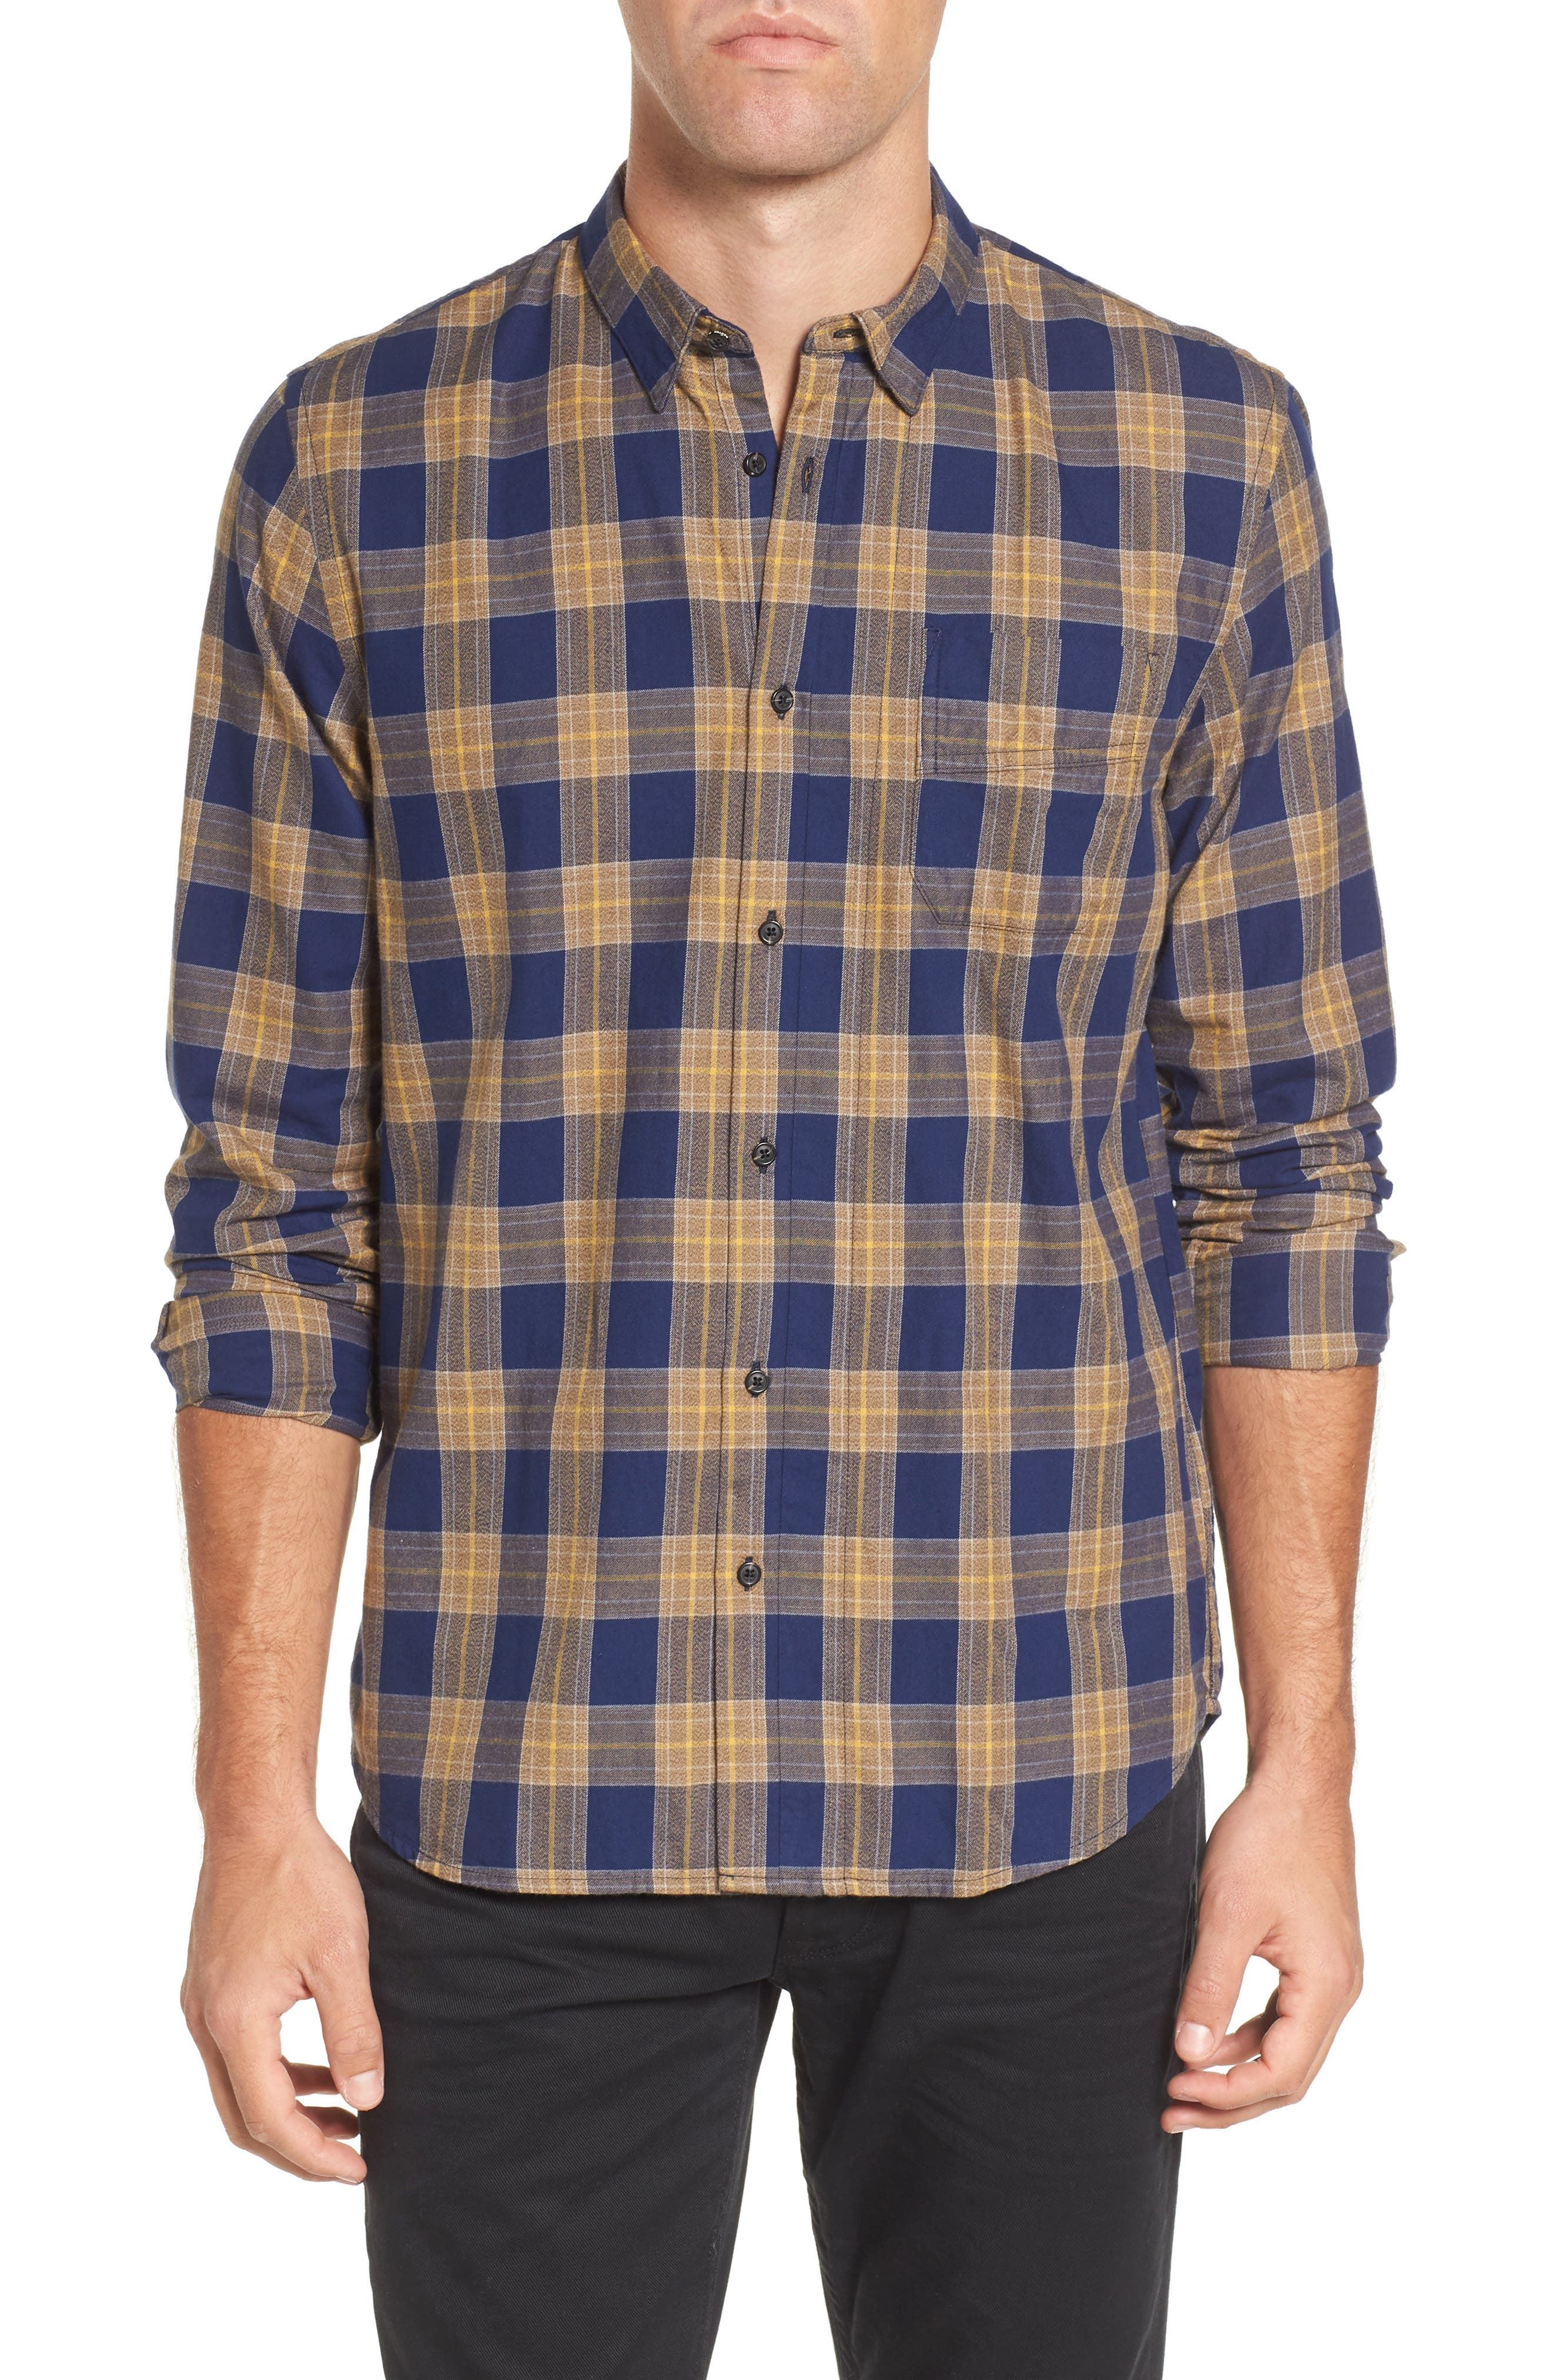 Main Image - Scotch & Sode Brushed Cotton Shirt